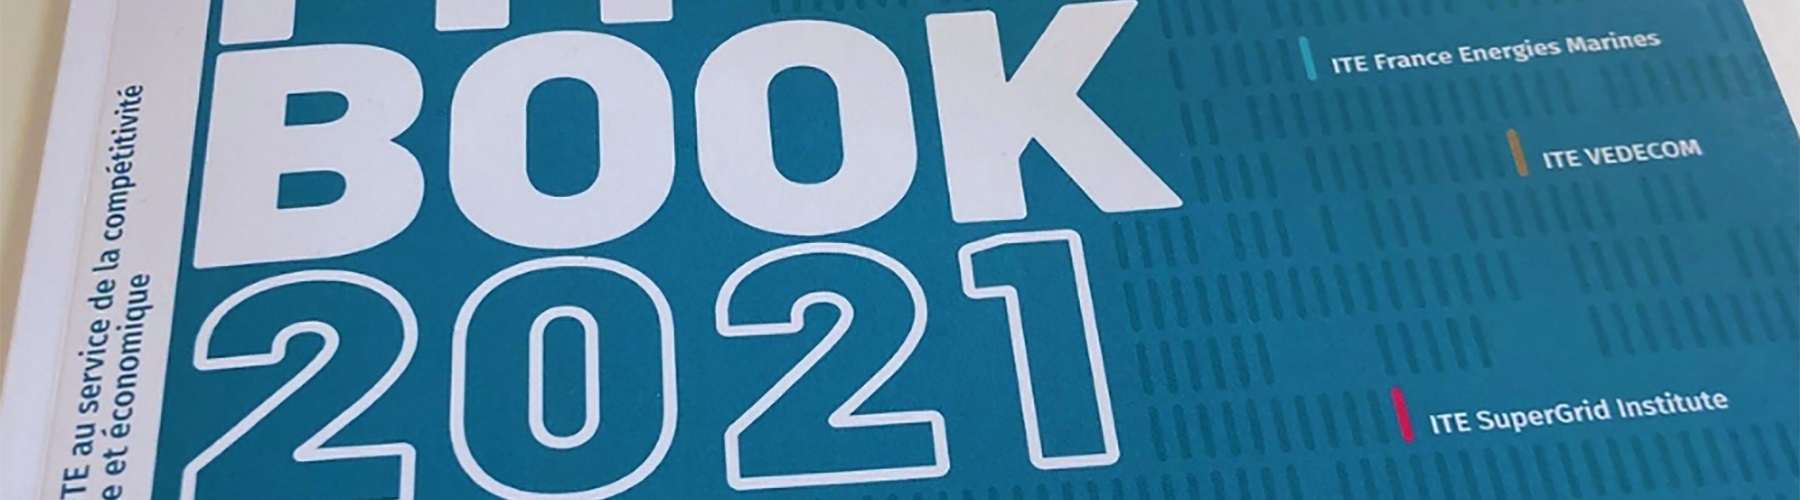 fit book 2021 desk